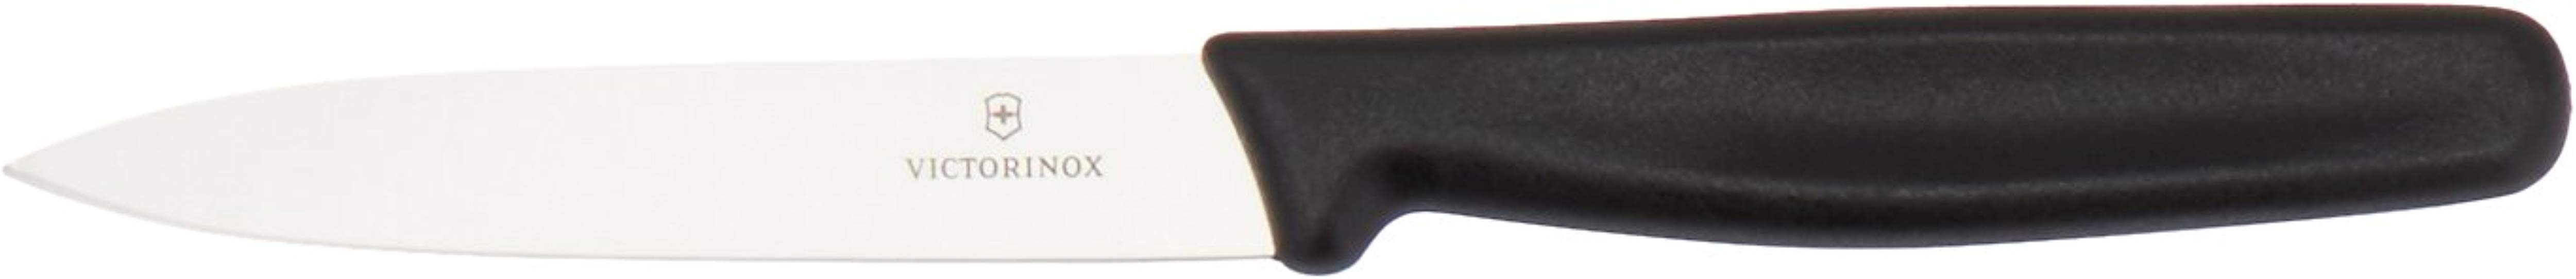 Victorinox Utility Knife